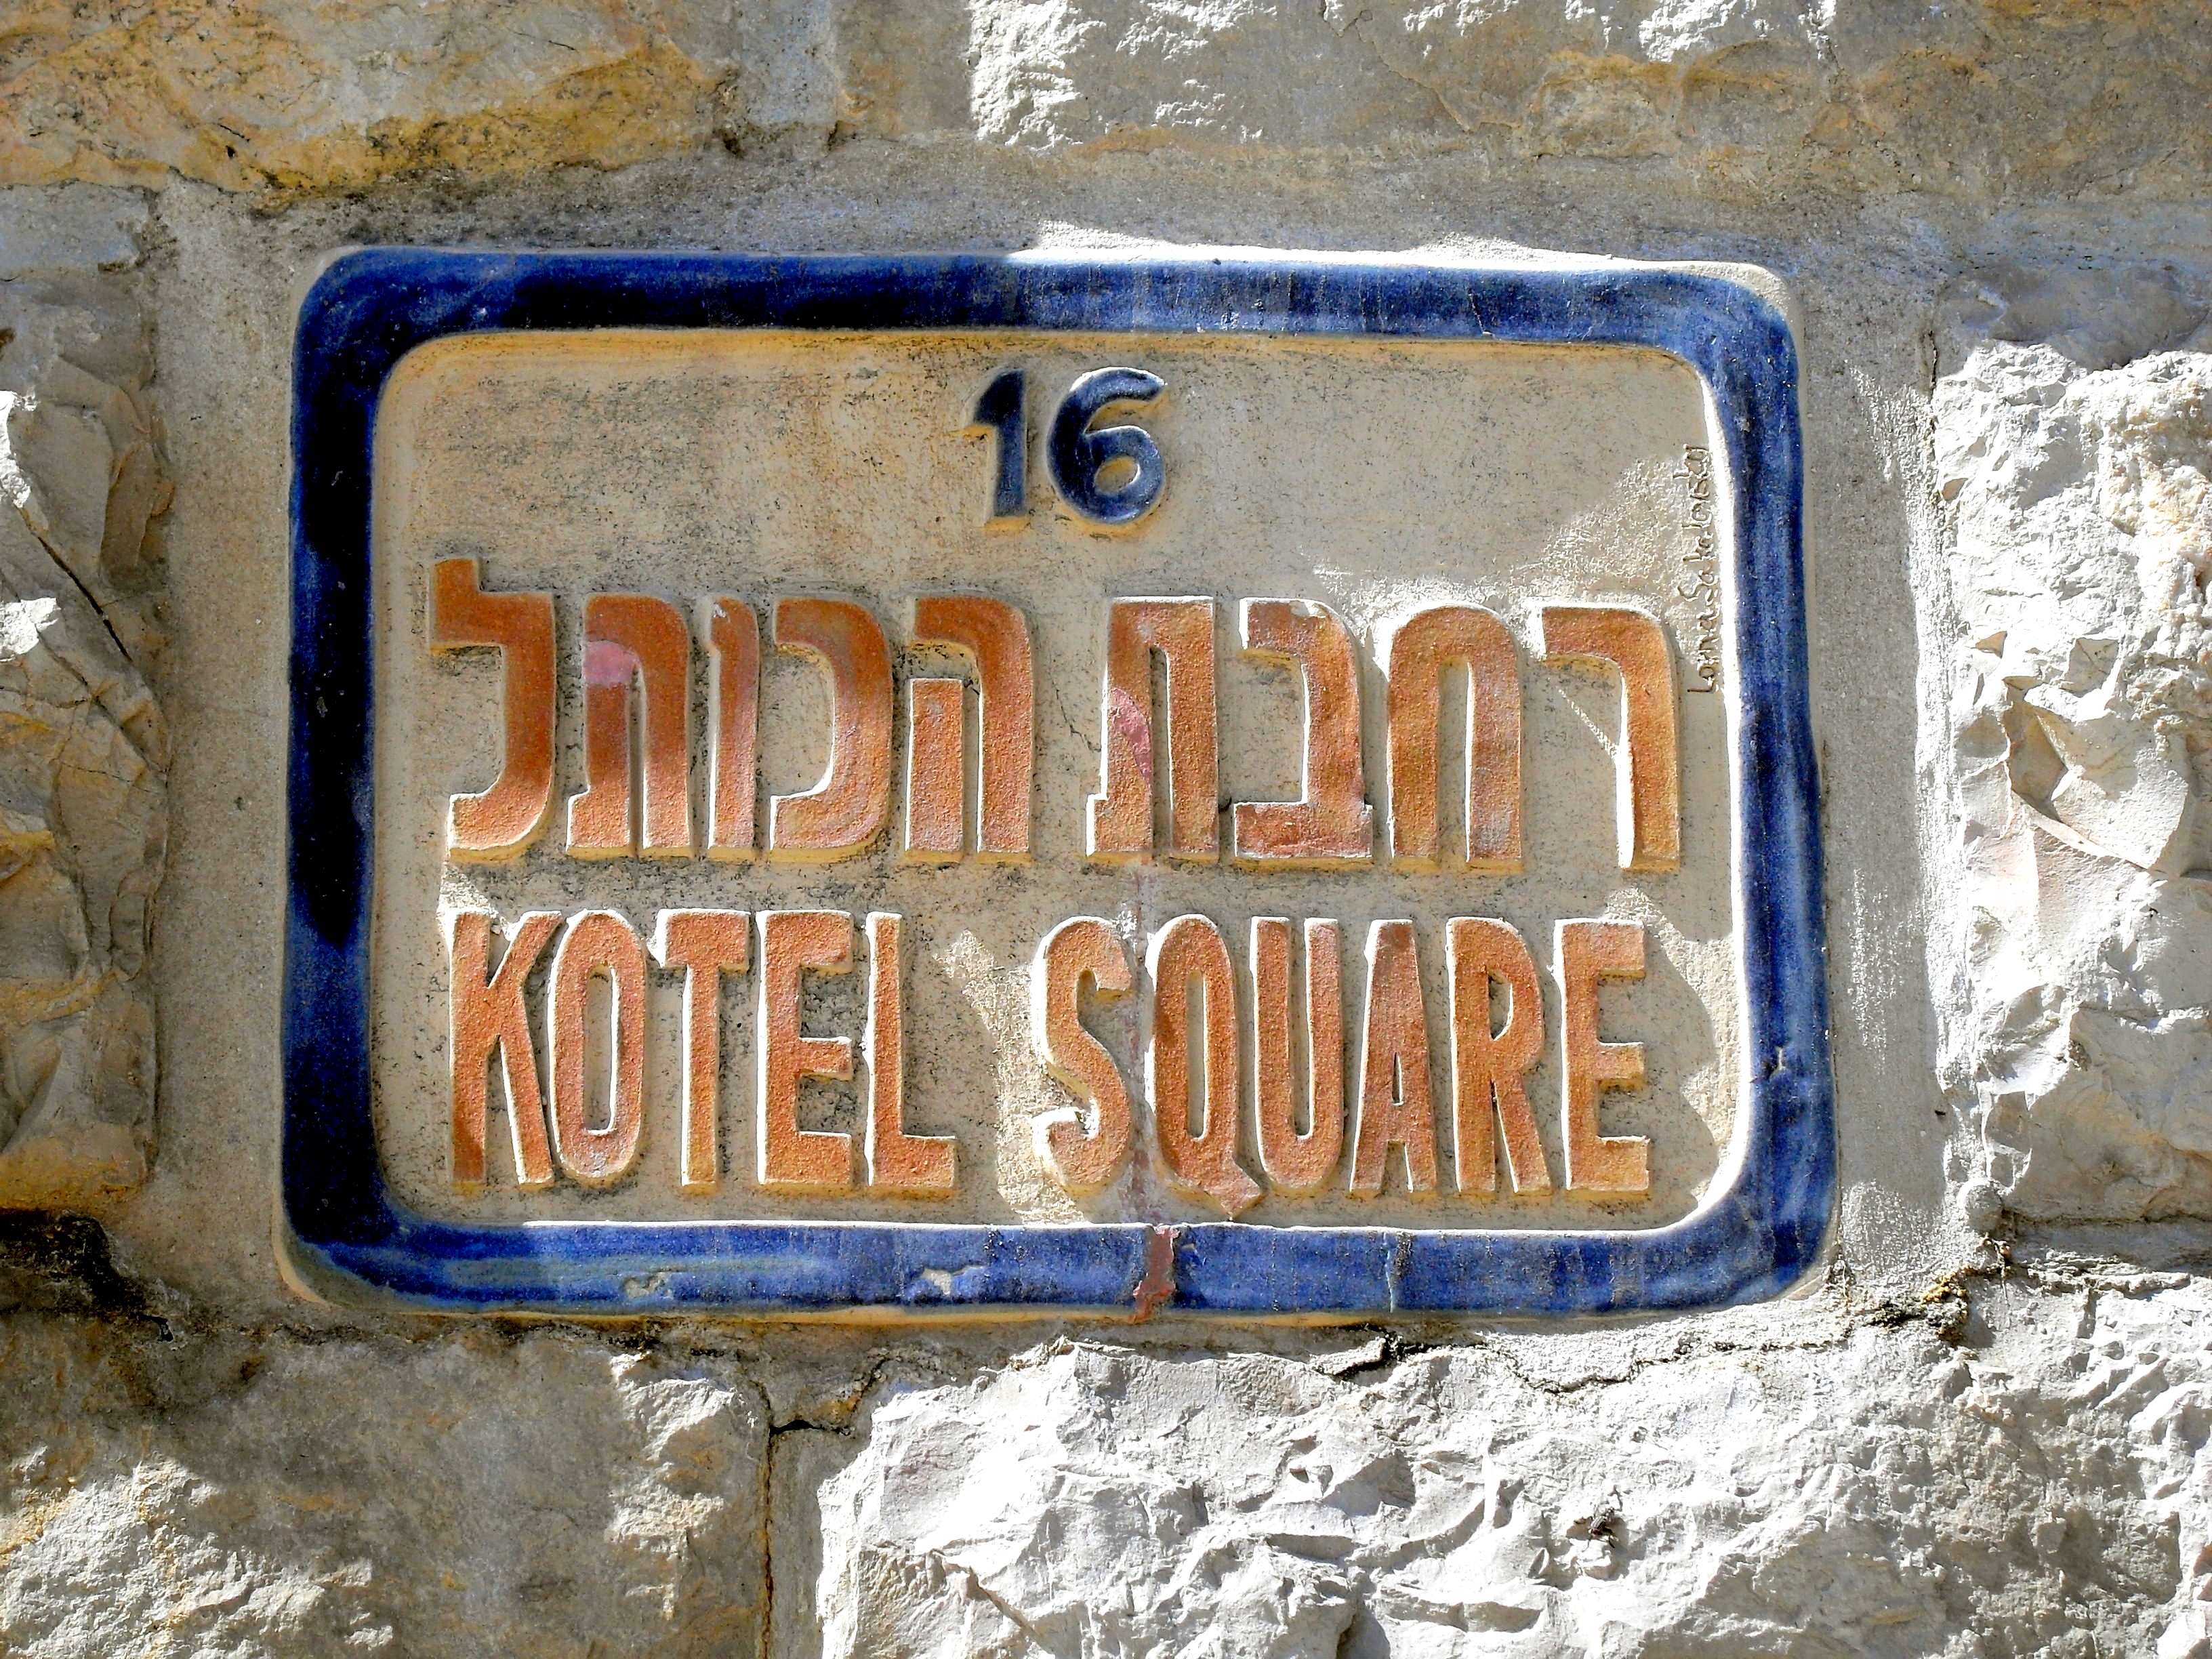 Fileold Jerusalem סיורובע Kotel Square Signjpg Wikimedia Commons